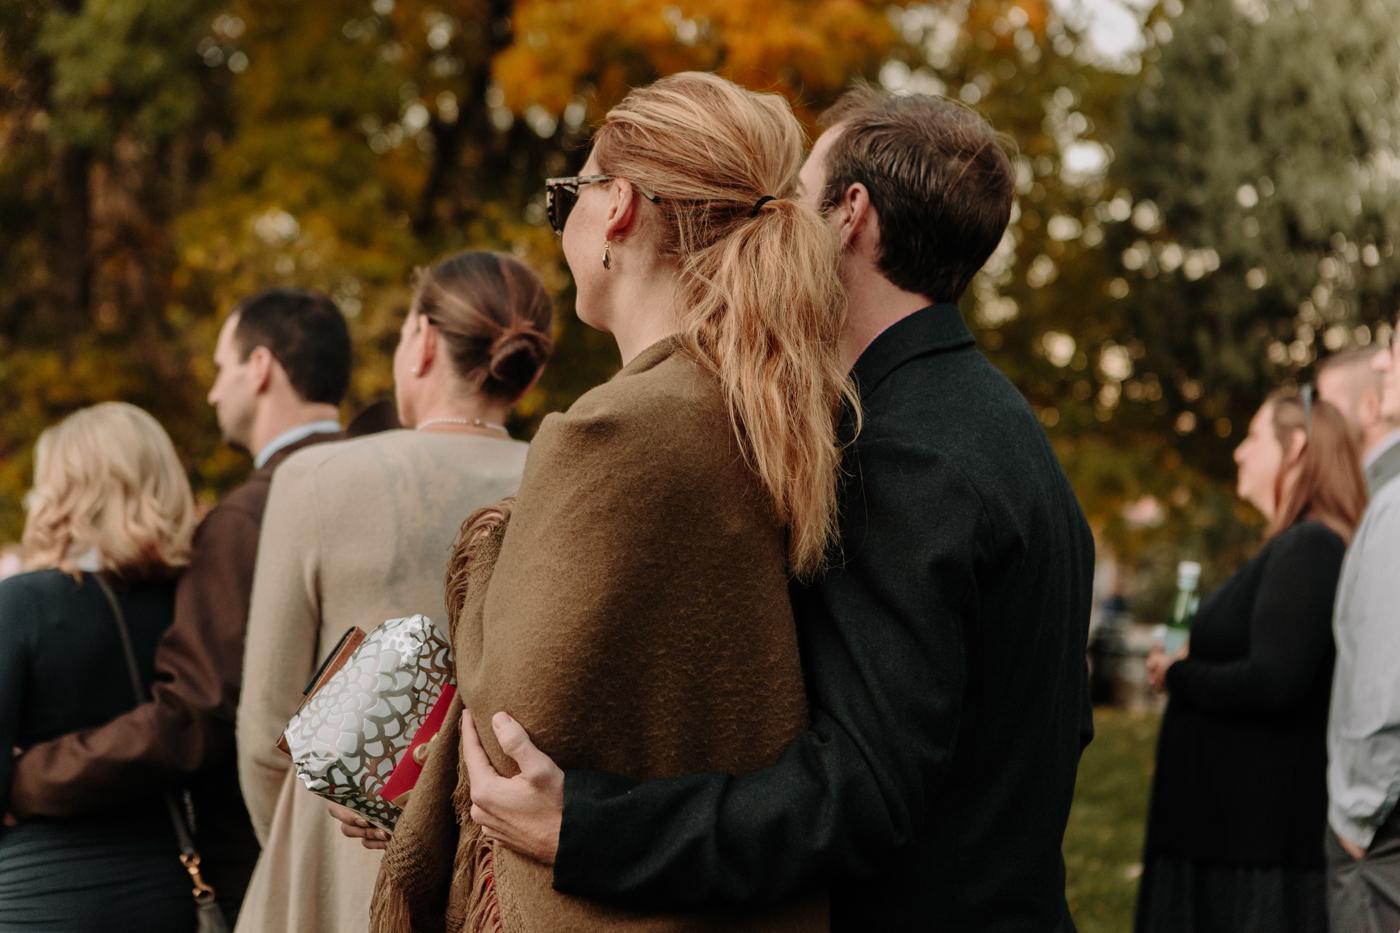 boulder-museum-modern-art-colorado-wedding-52.jpg